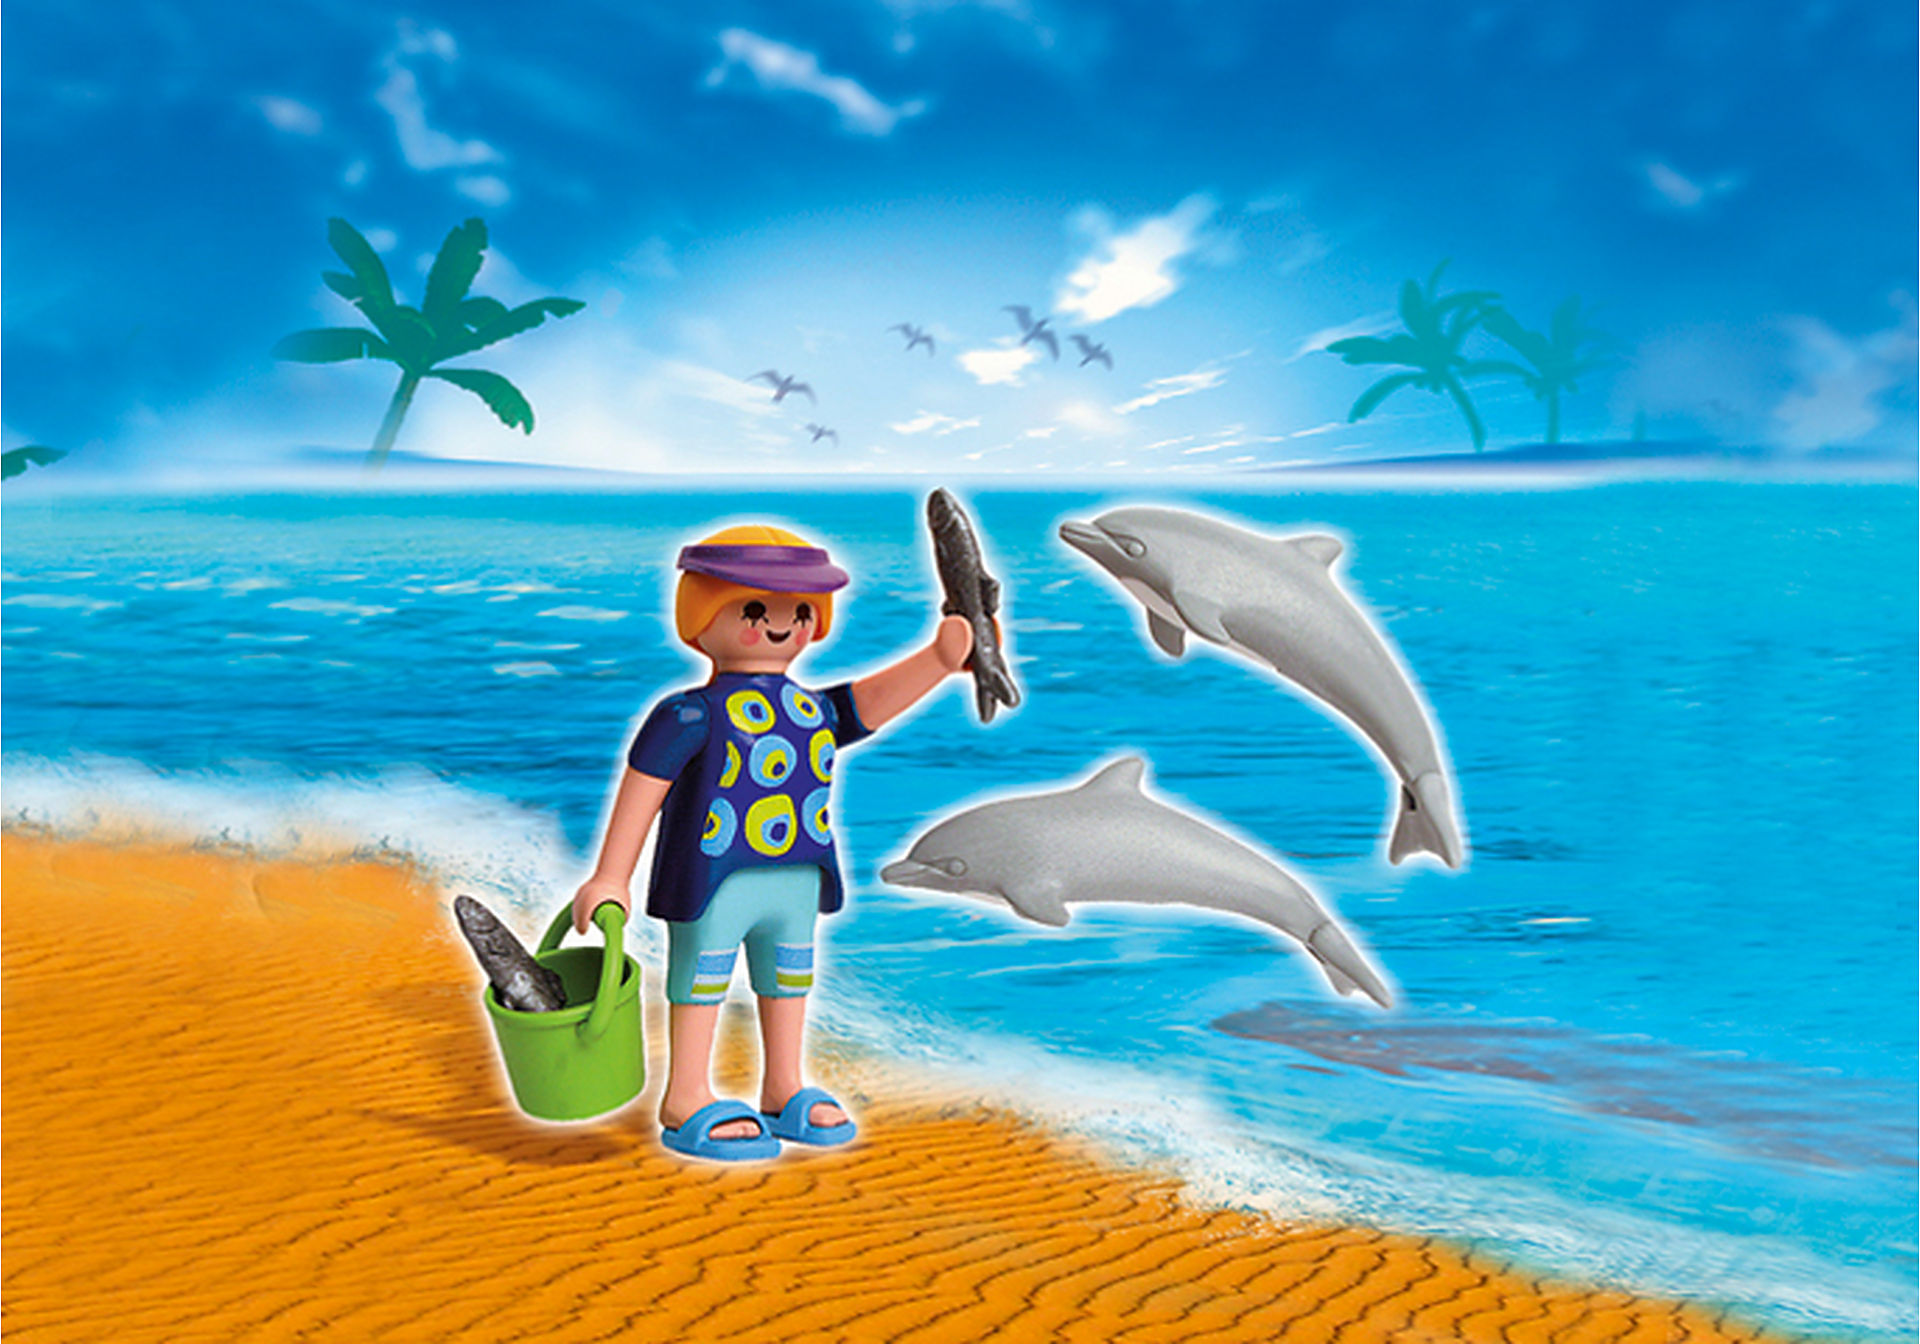 http://media.playmobil.com/i/playmobil/5876-A_product_detail/PLAYMOBIL Duo Vacancière et dauphins